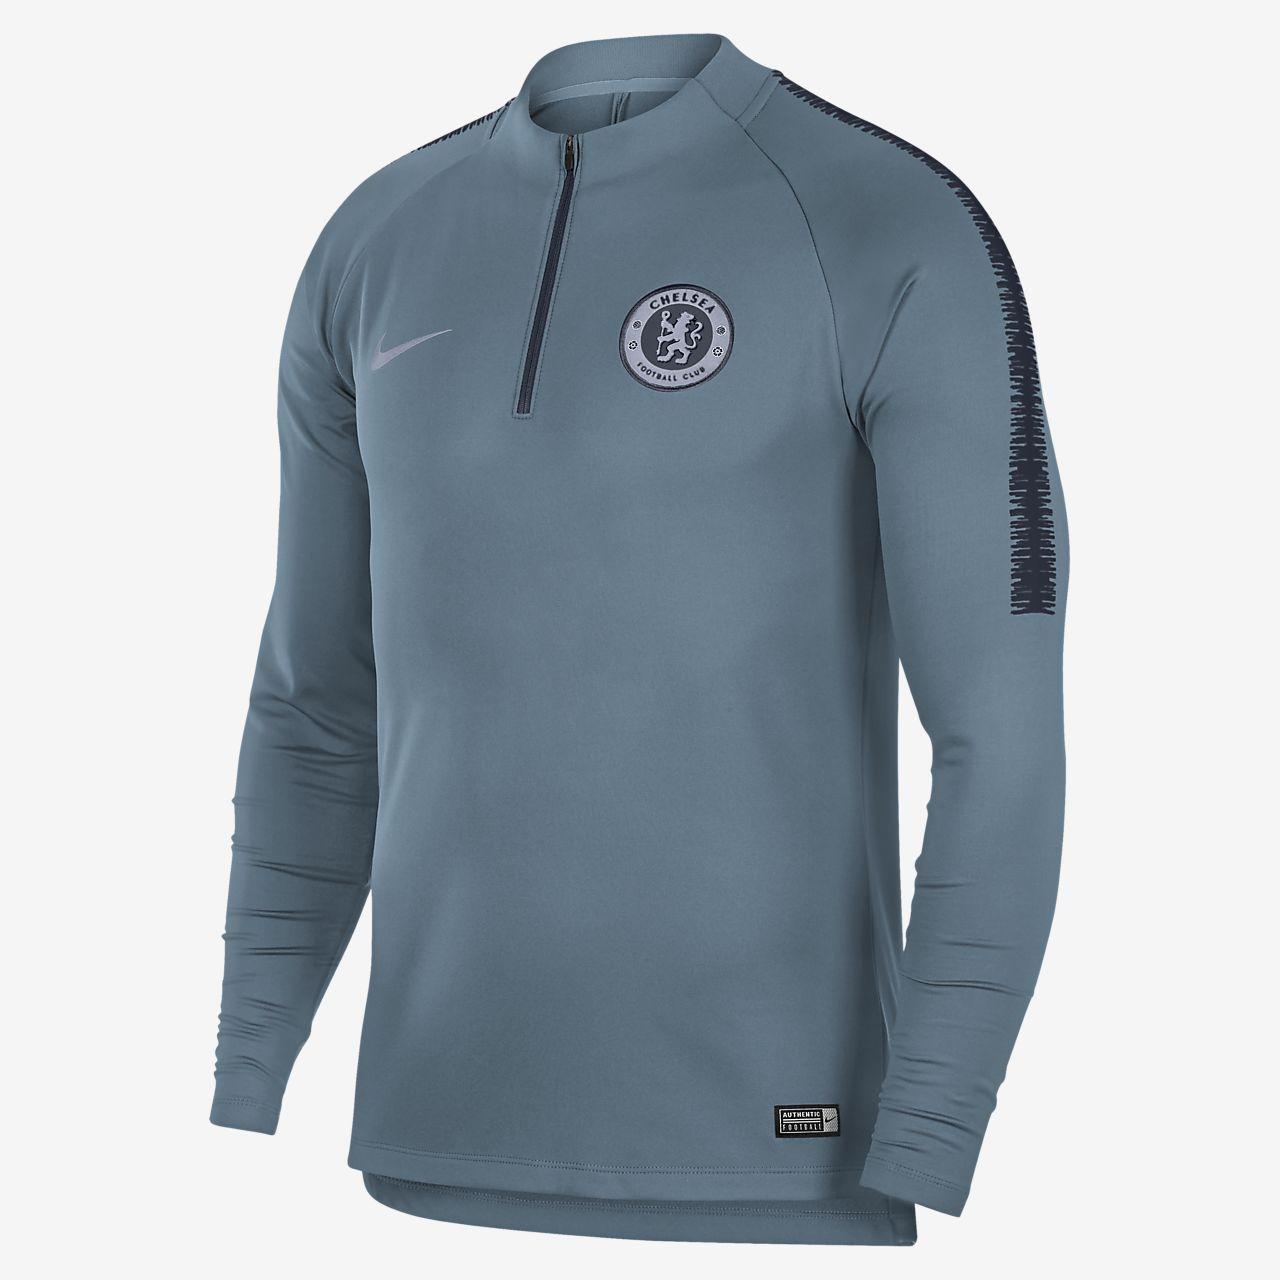 8bdc966cec Chelsea FC Dri-FIT Squad Drill Men s Long-Sleeve Football Top. Nike ...